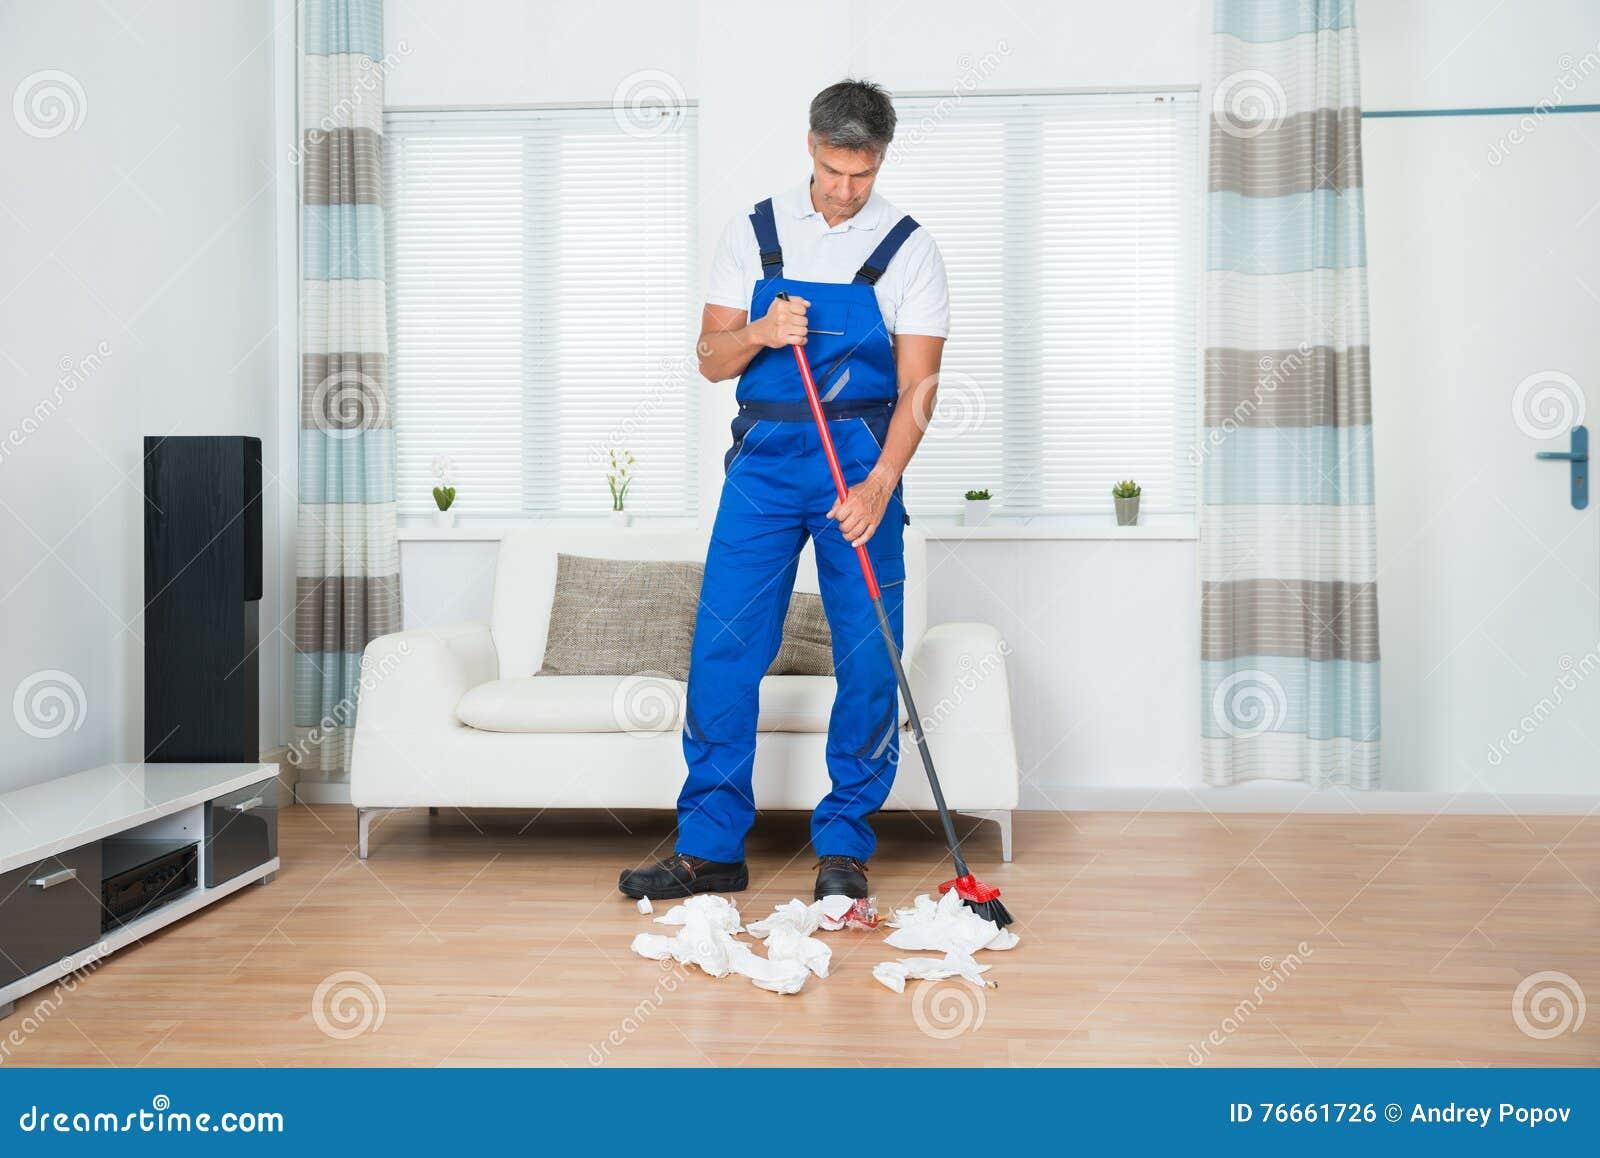 Man Sweeping The Living Room Stock Photo Cartoondealer